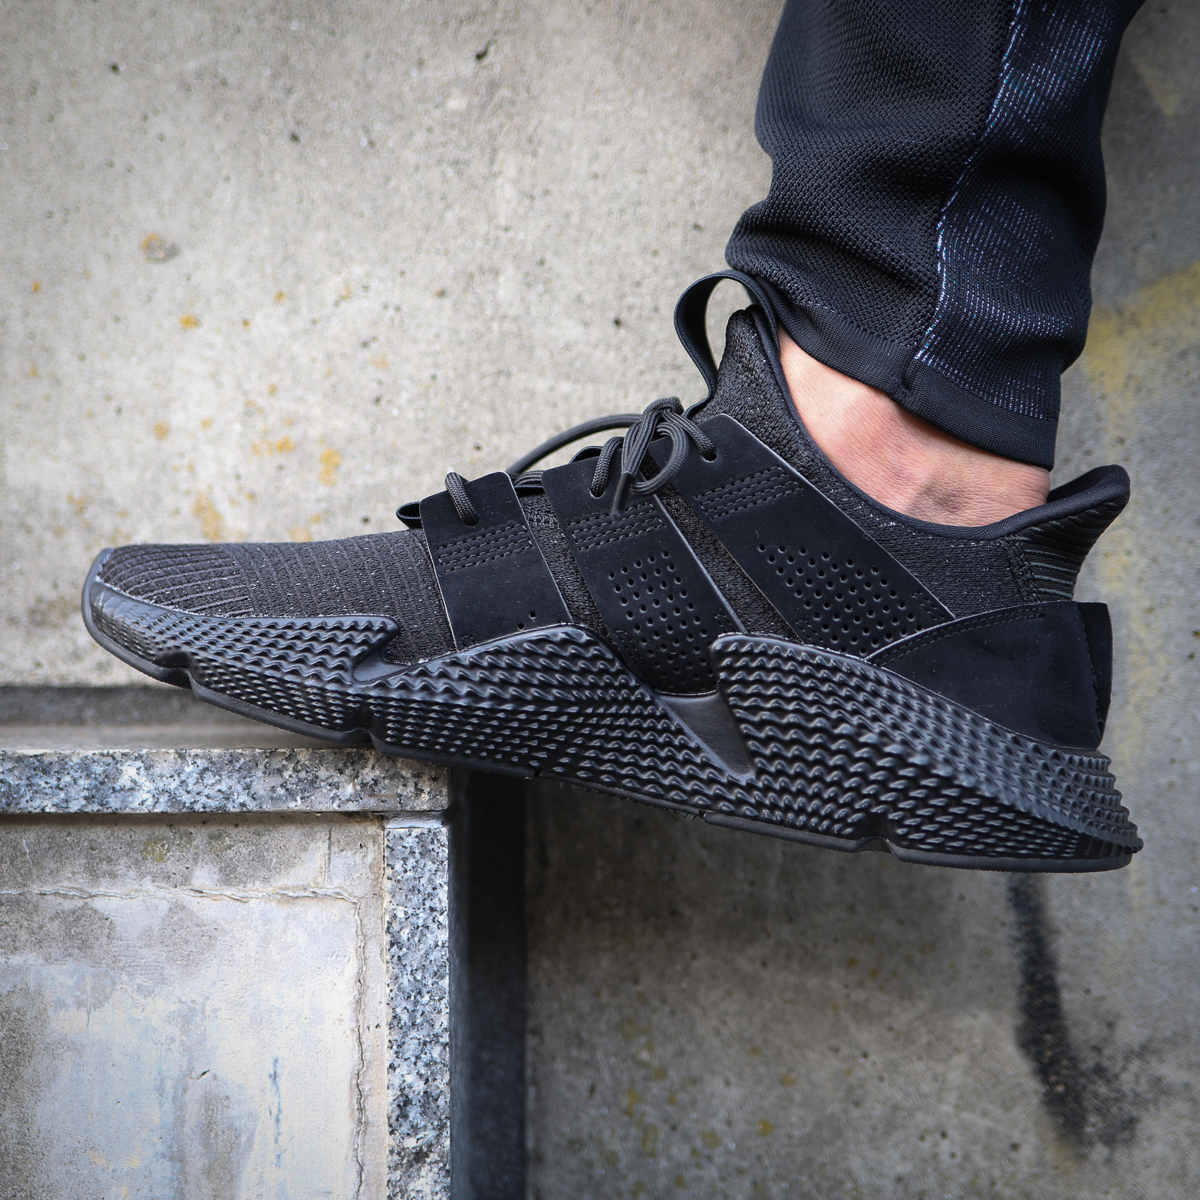 adidas prophere black core - 64% remise